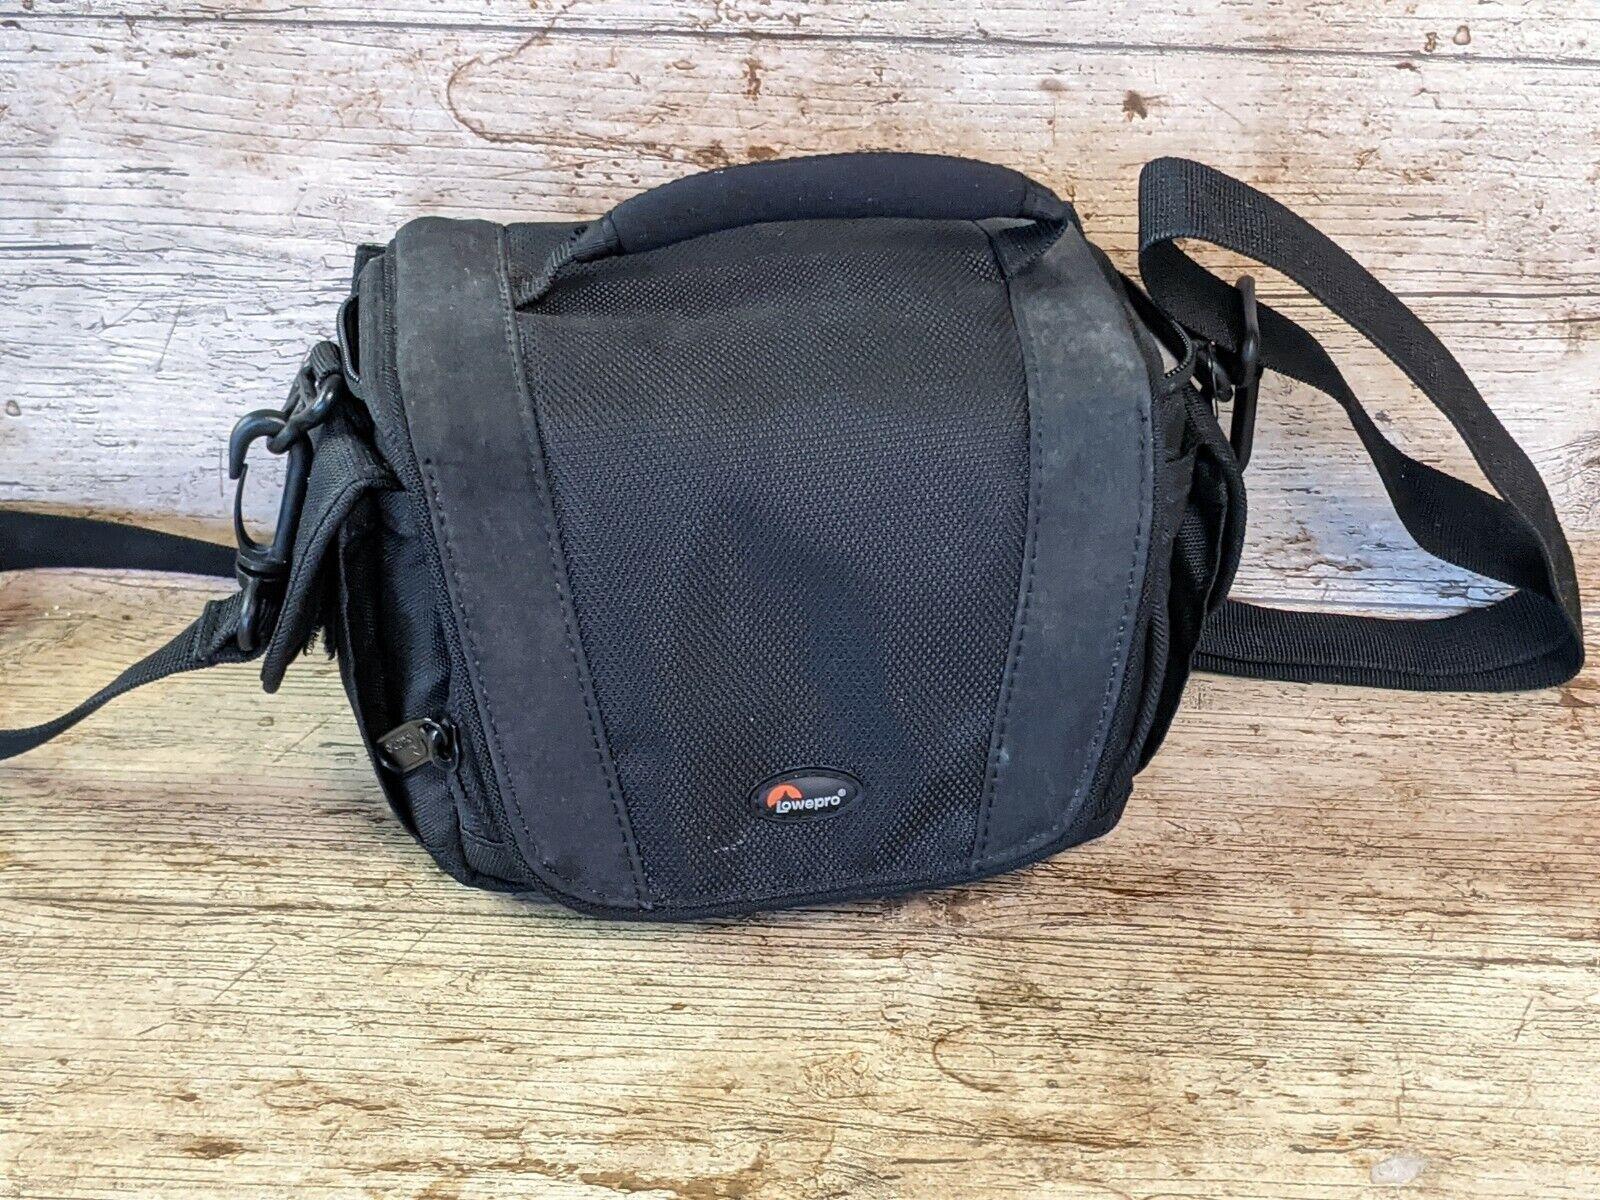 Lowepro Edit 110 - Small Padded Camera / Camcorder Shoulder Bag